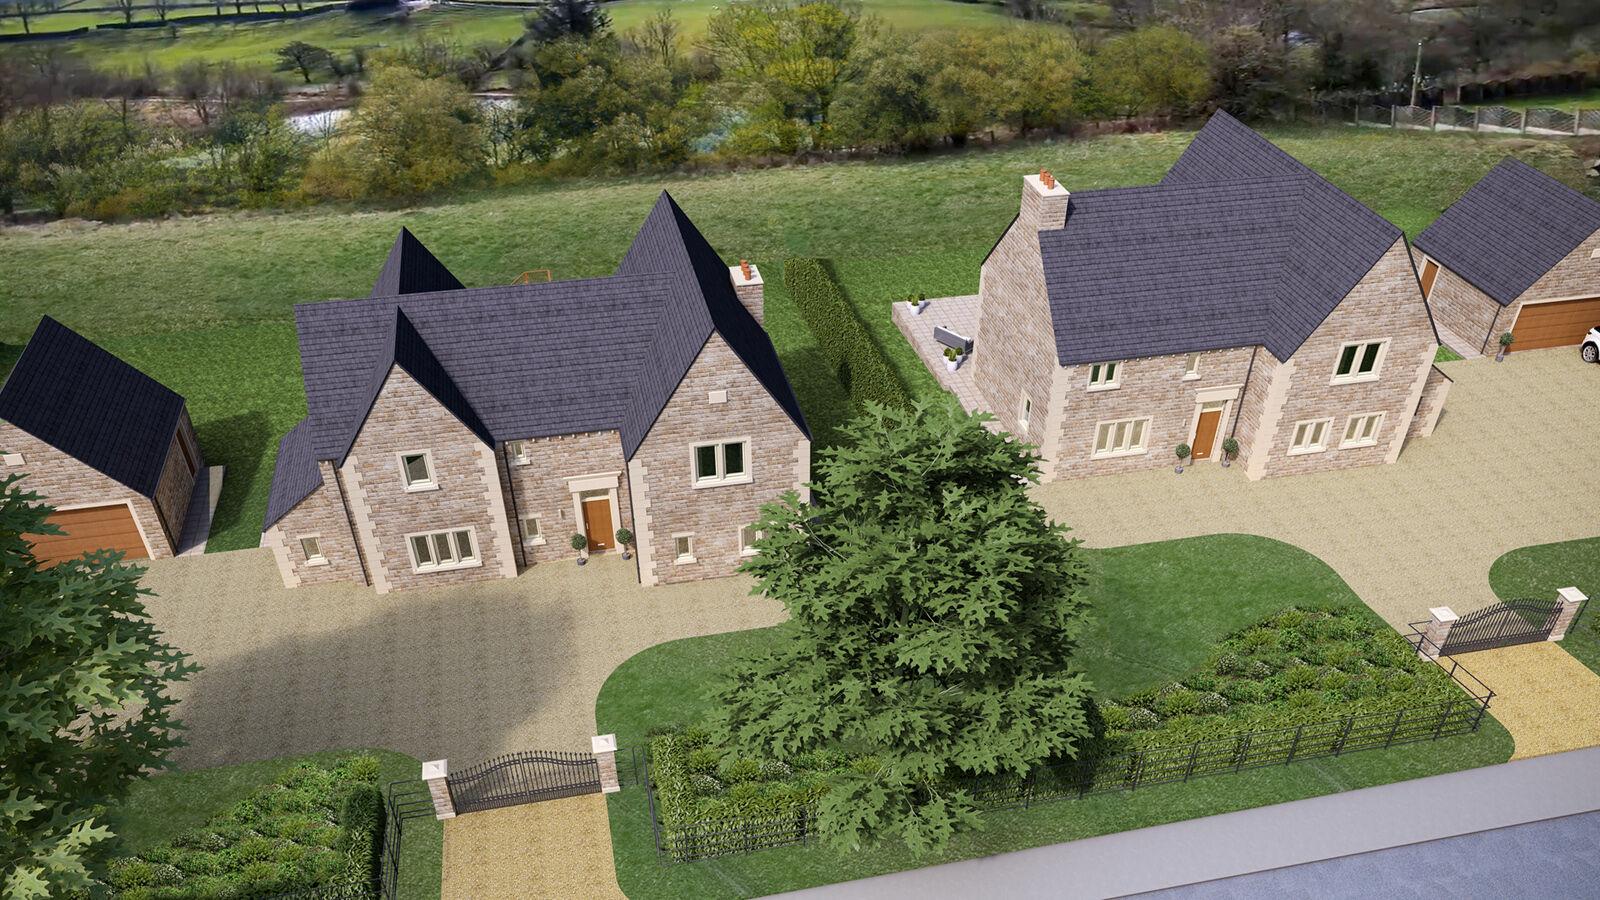 Ferndean View - Barnfield Homes